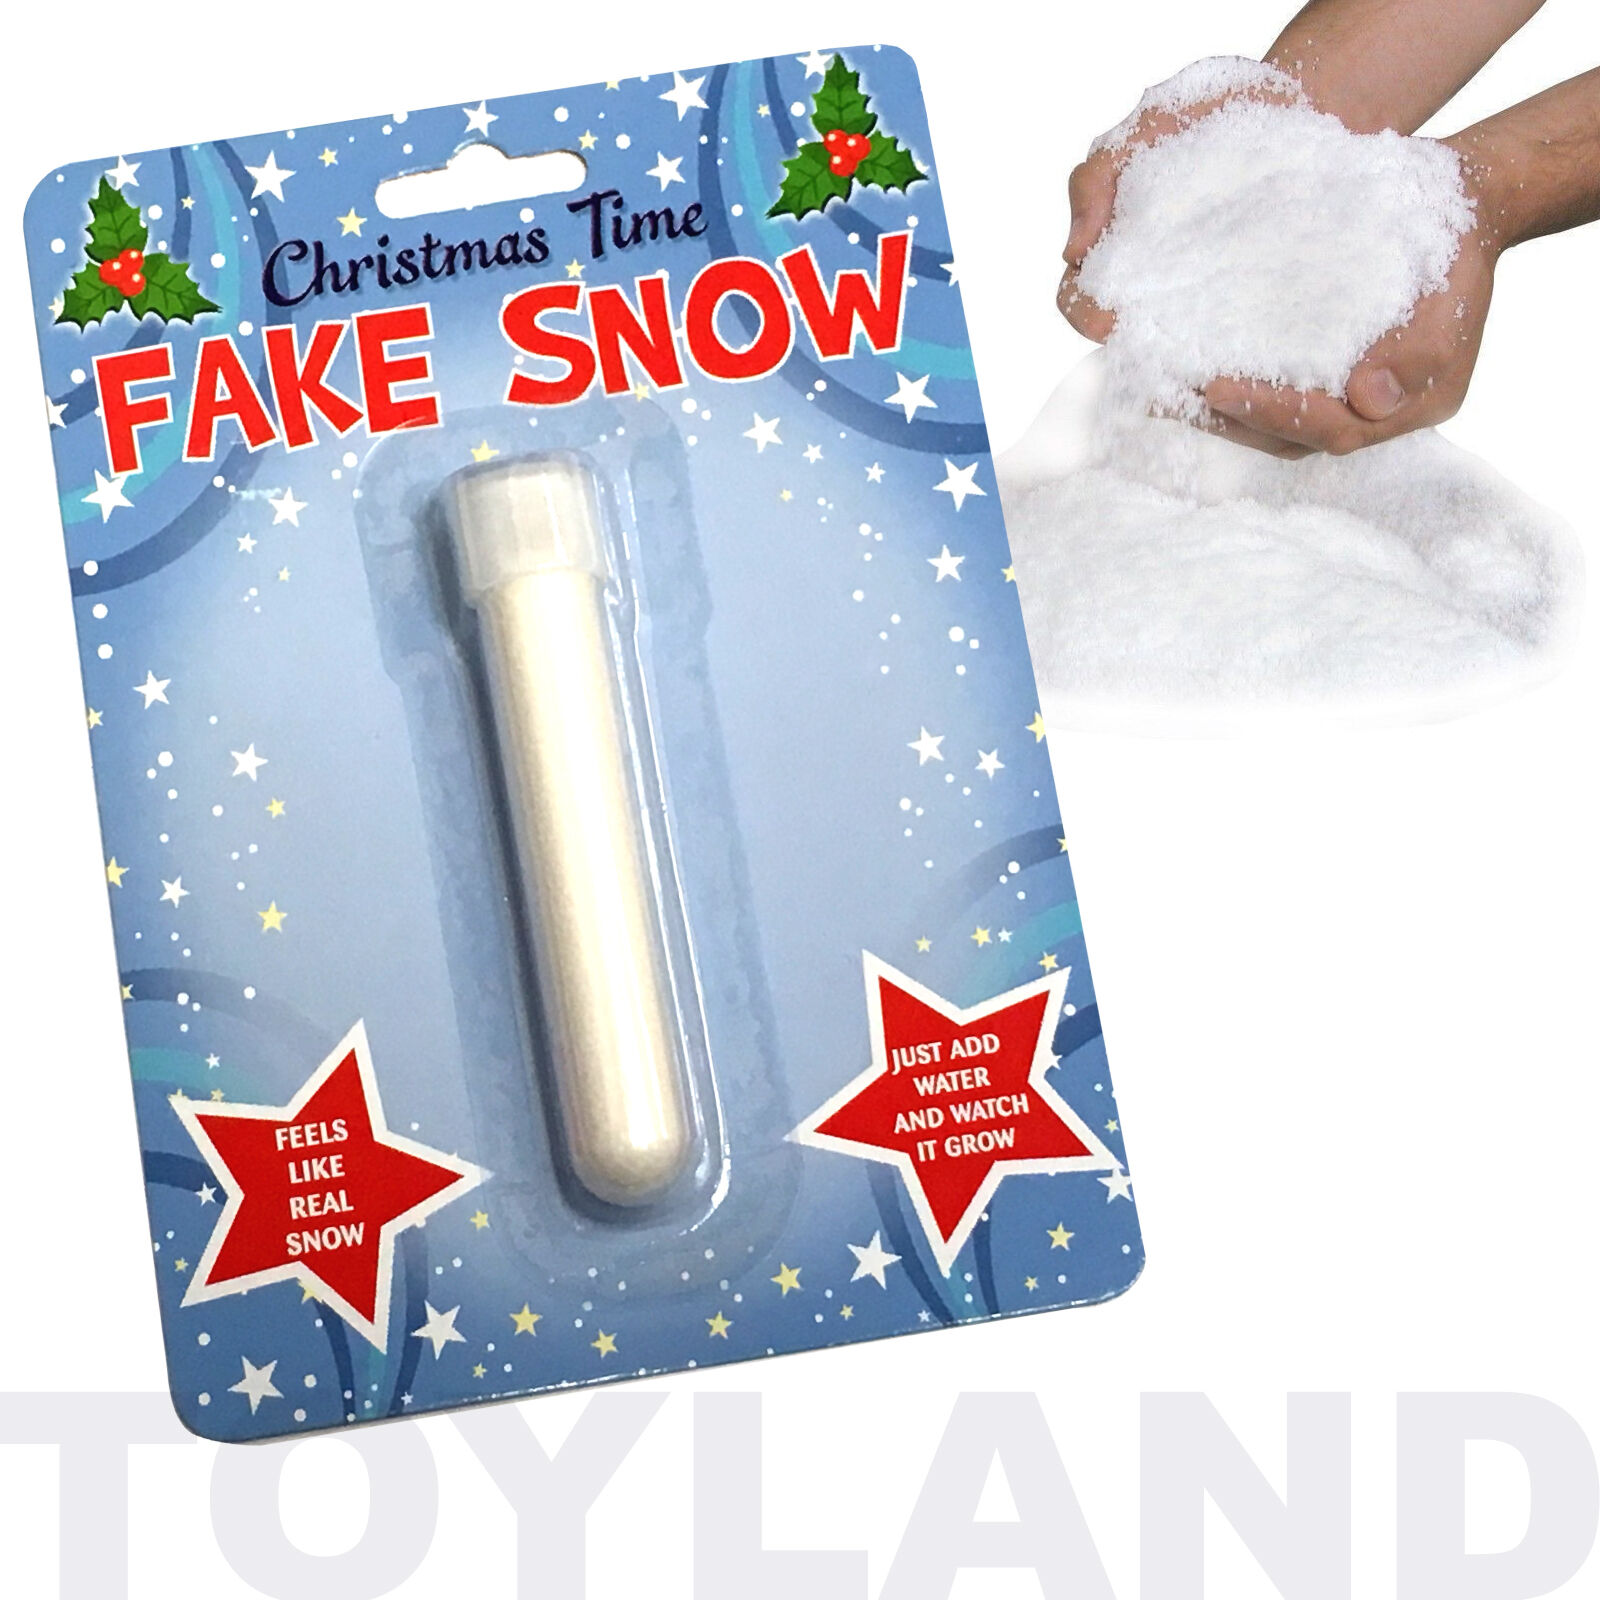 MAGIC FAKE SNOW TOY BOYS GIRLS XMAS SECRET SANTA GIFT CHRISTMAS STOCKING FILLER